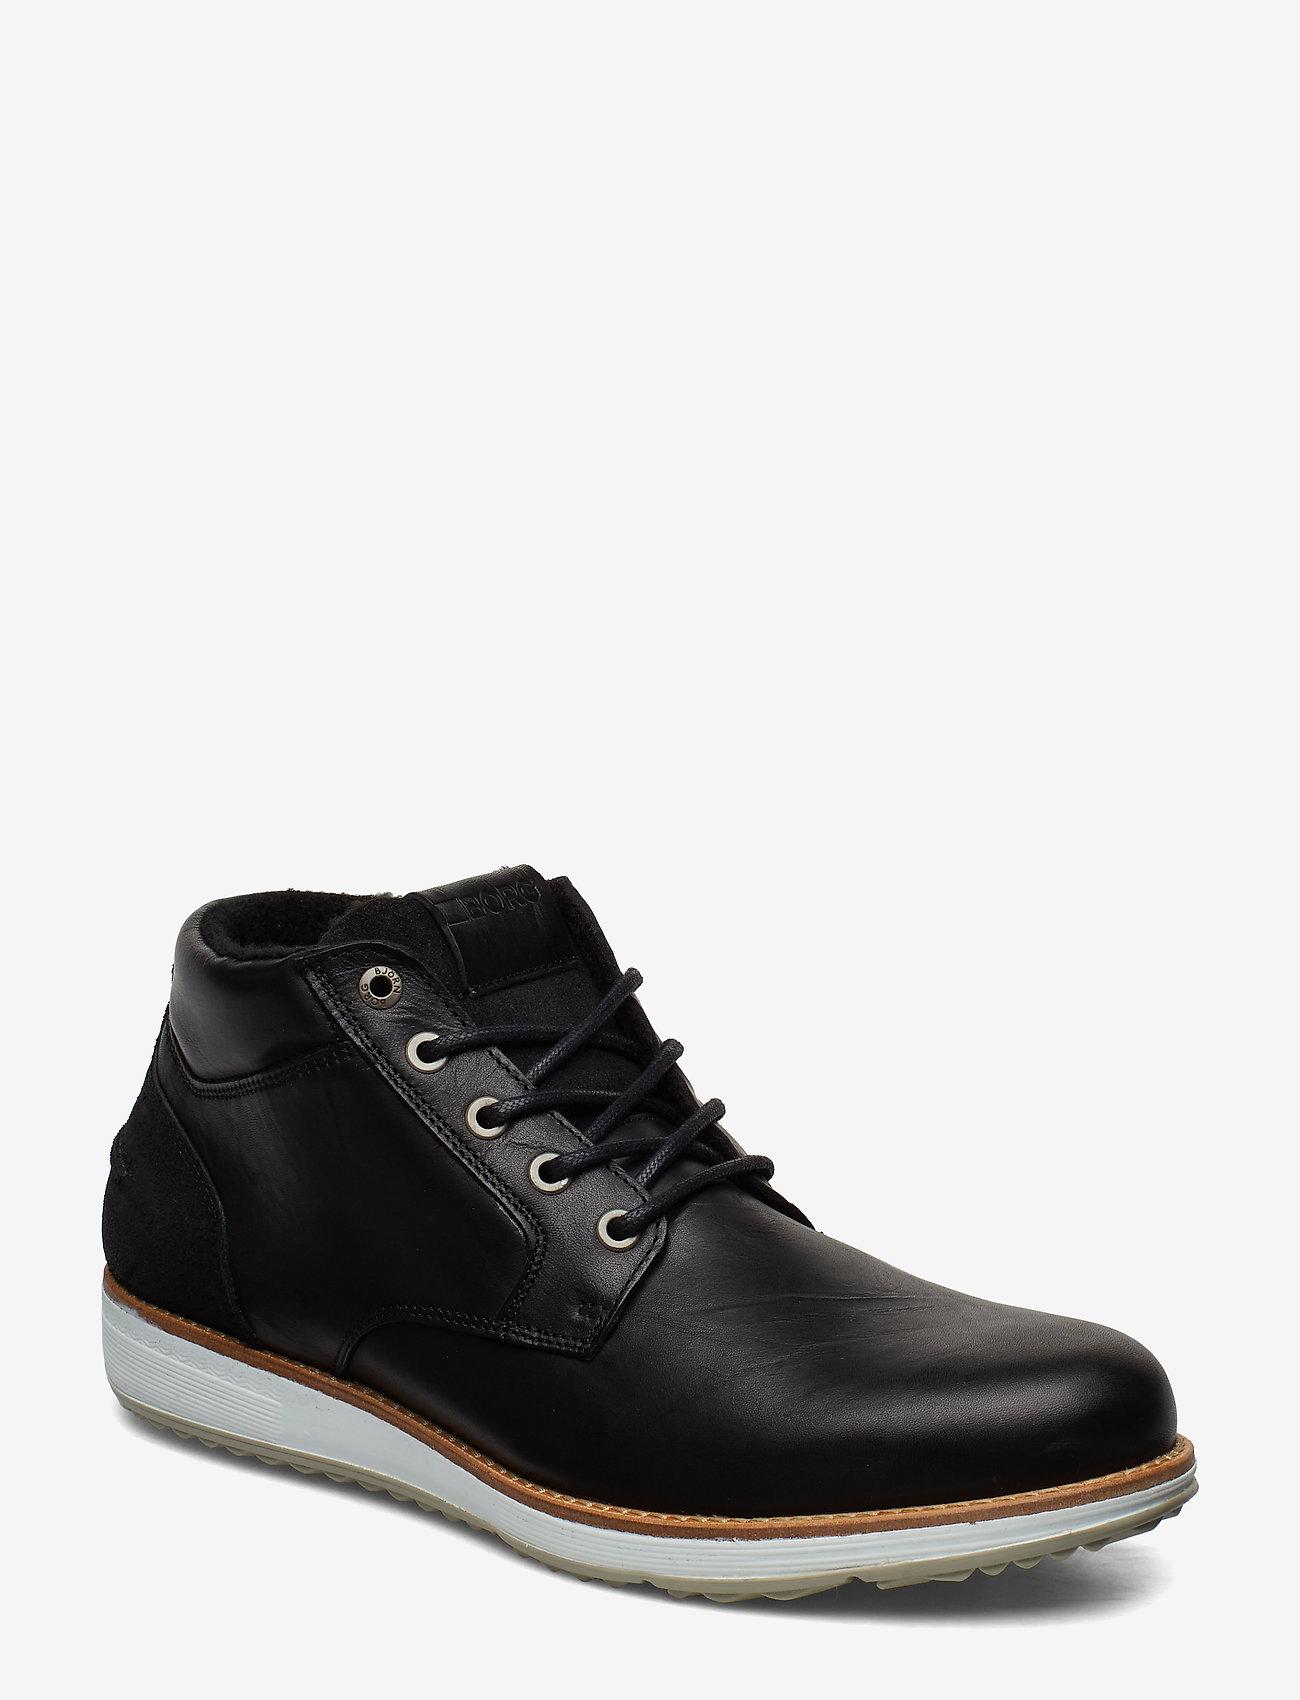 Björn Borg - SUNDAL MID M - laced boots - black - 0